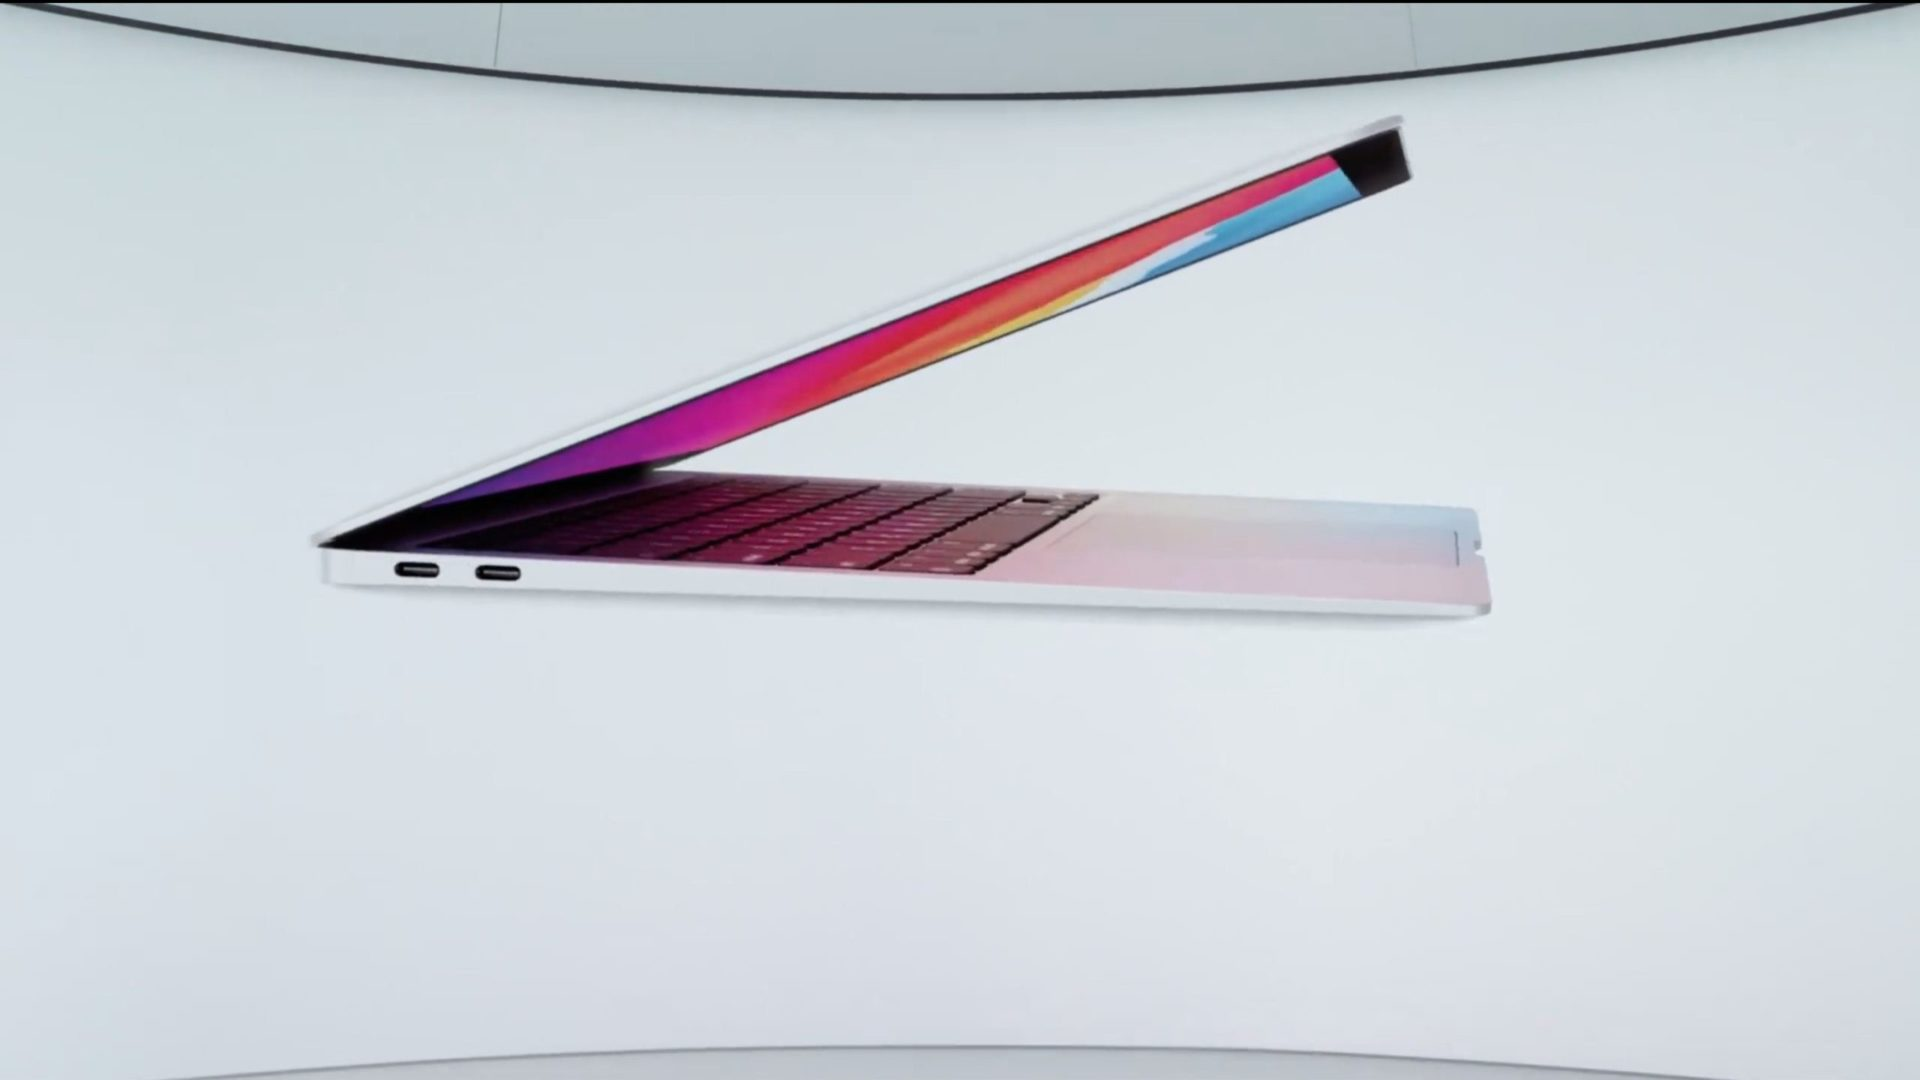 Apple's new Macbook Air